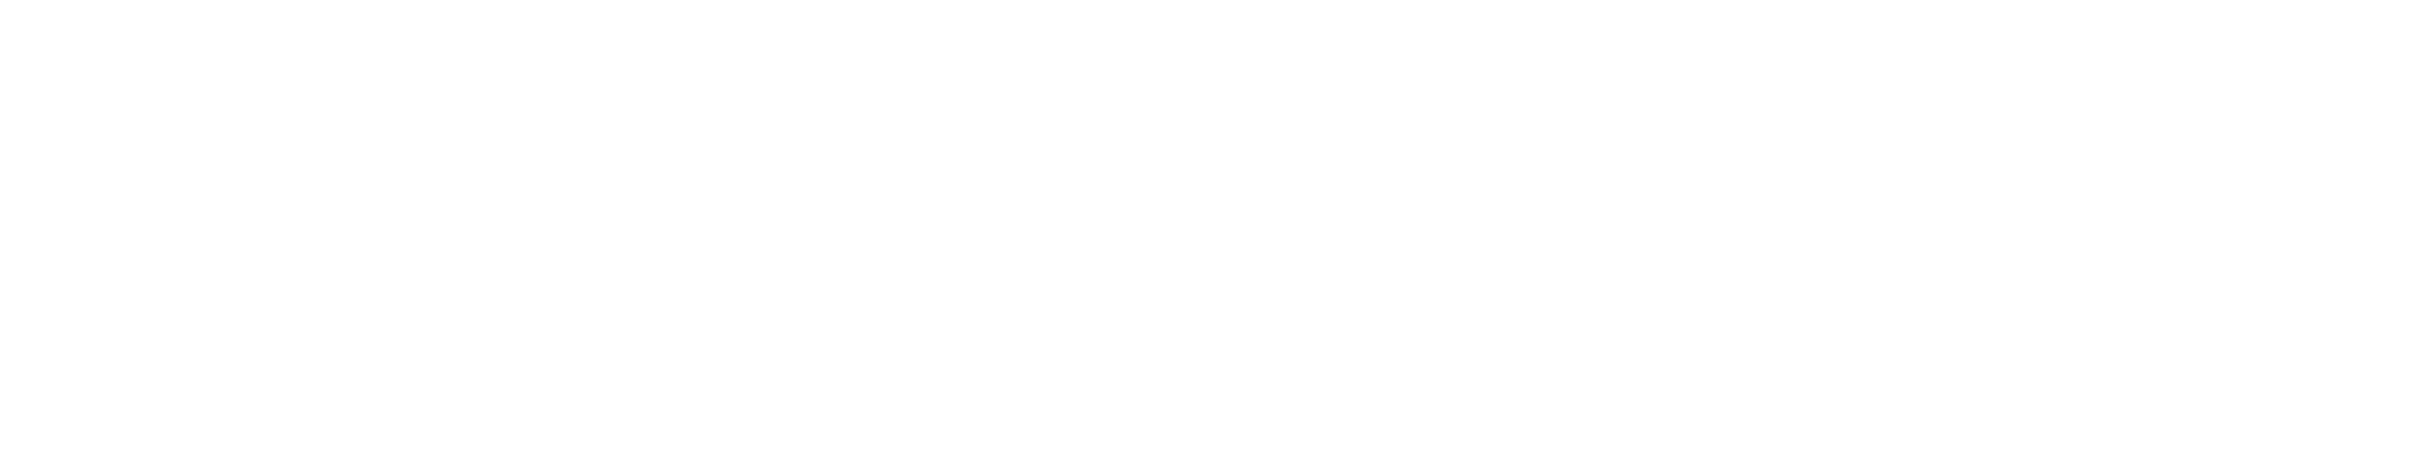 Varder logo hvit